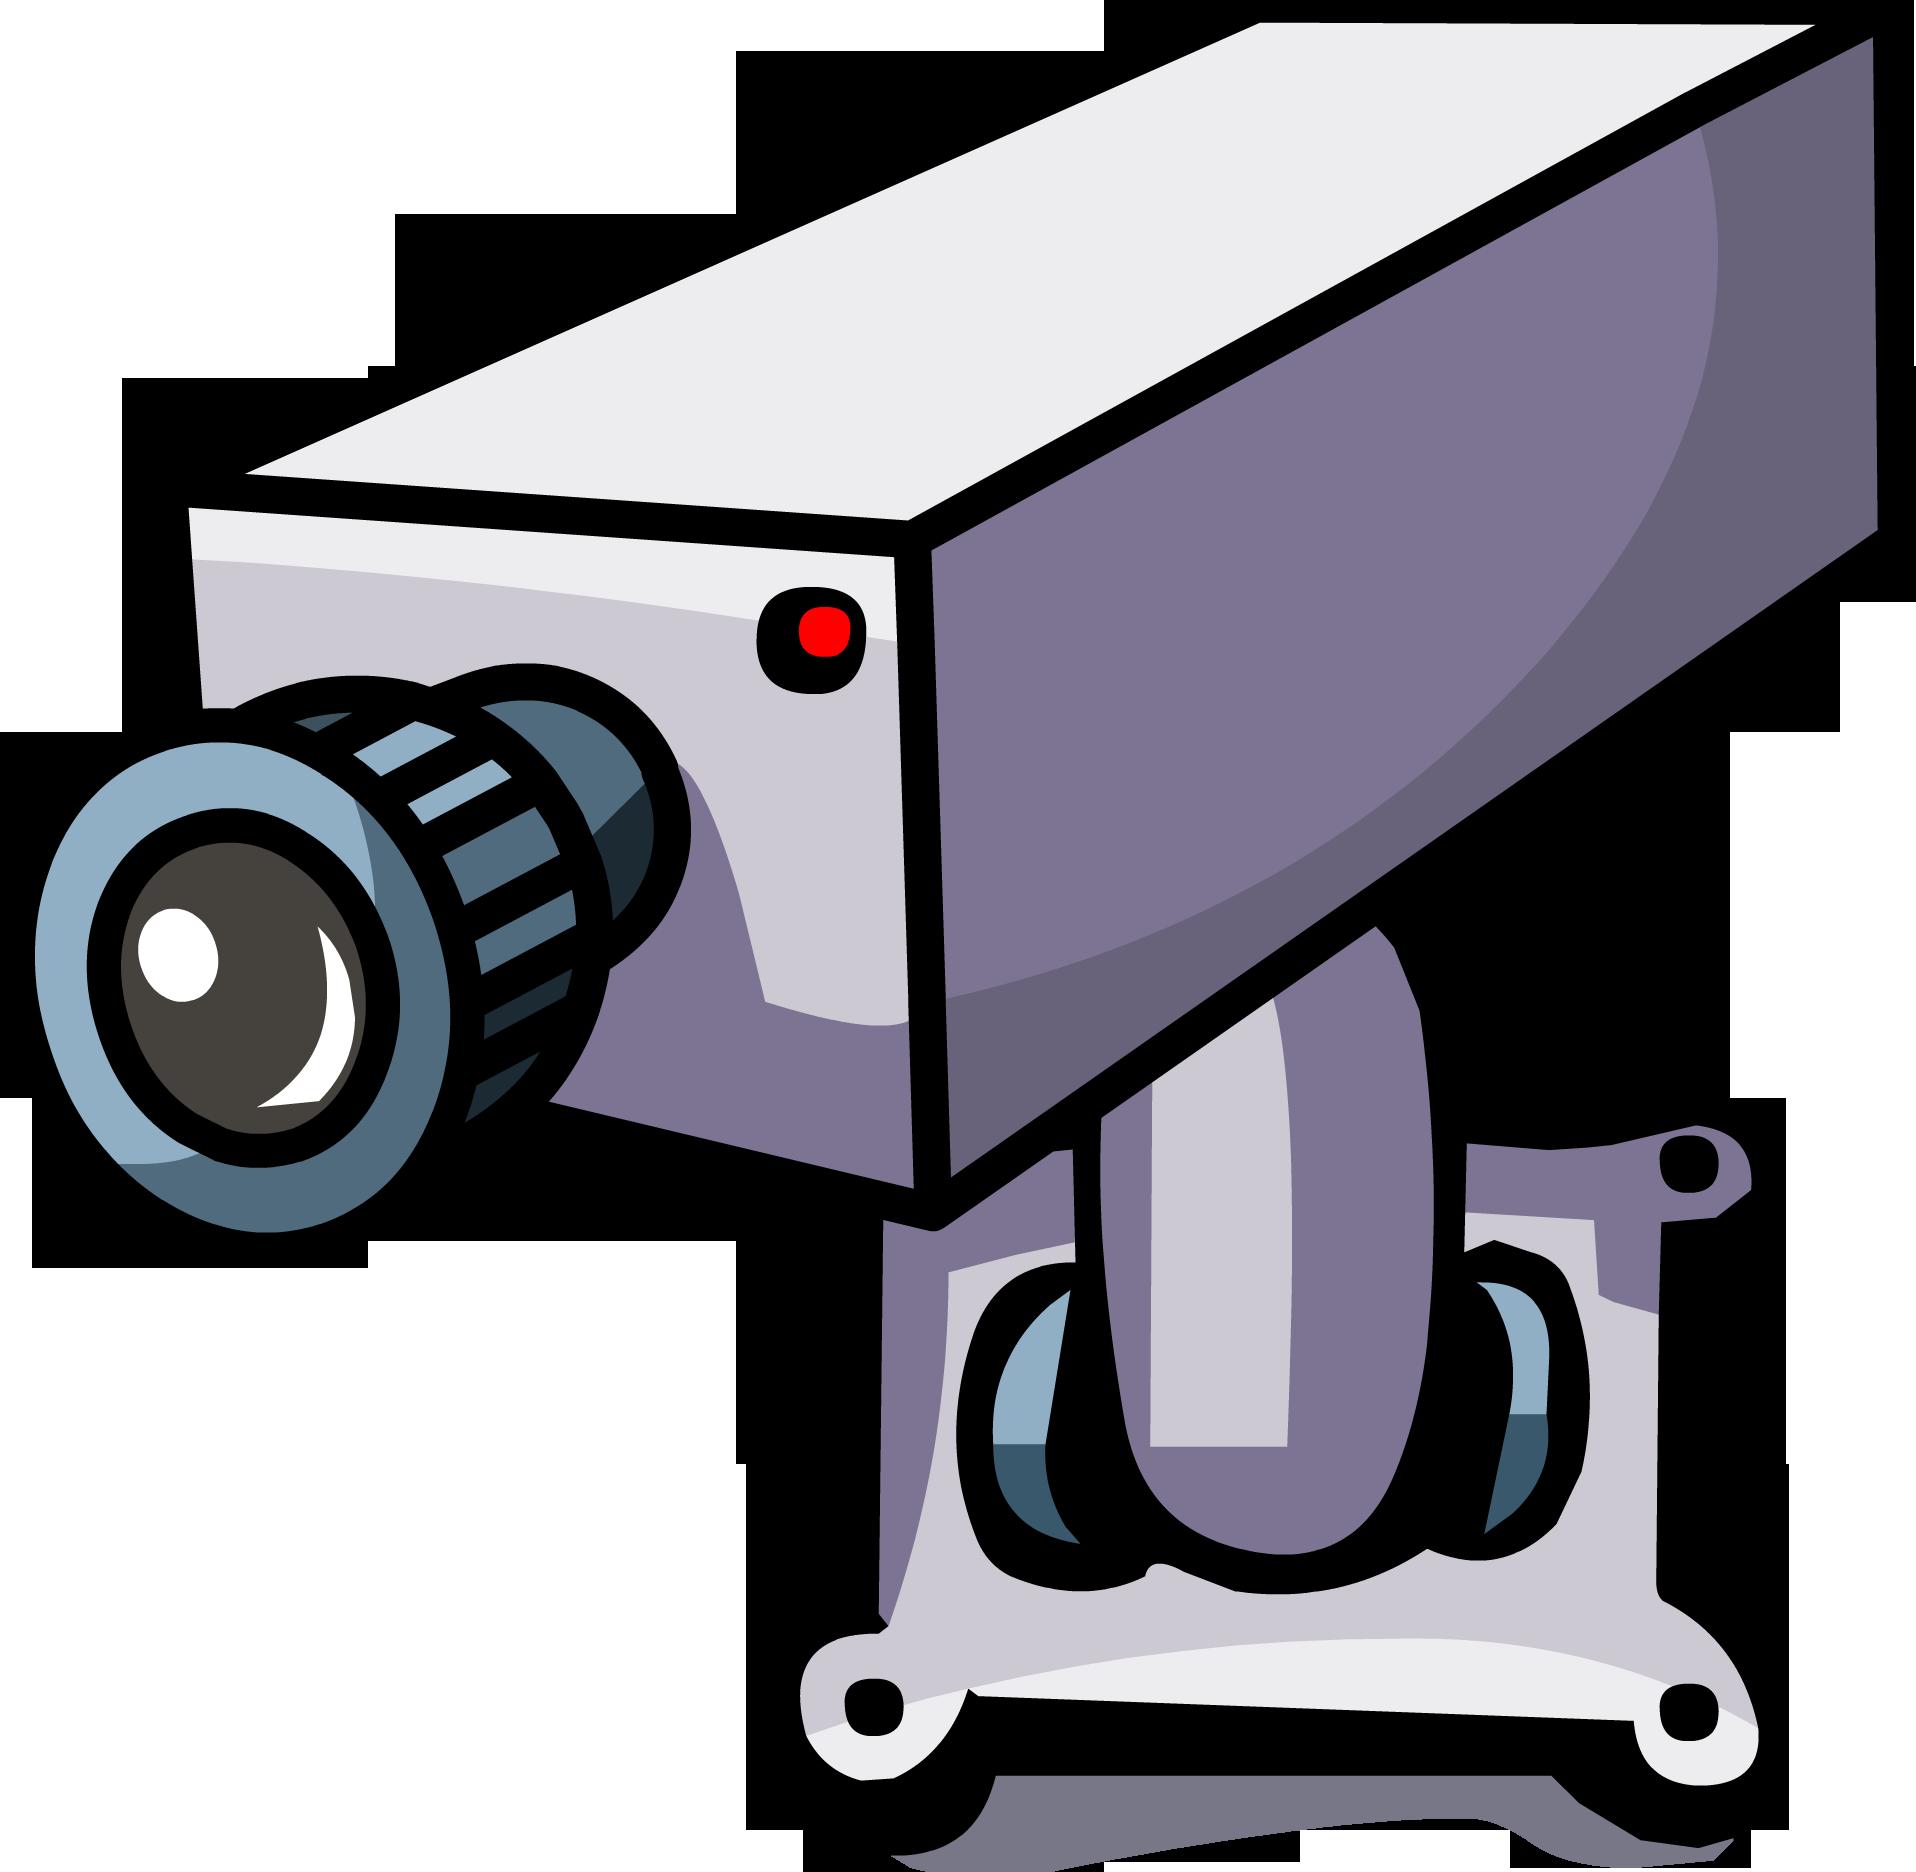 Security Camera | Club Penguin Wiki | Fandom powered by Wikia